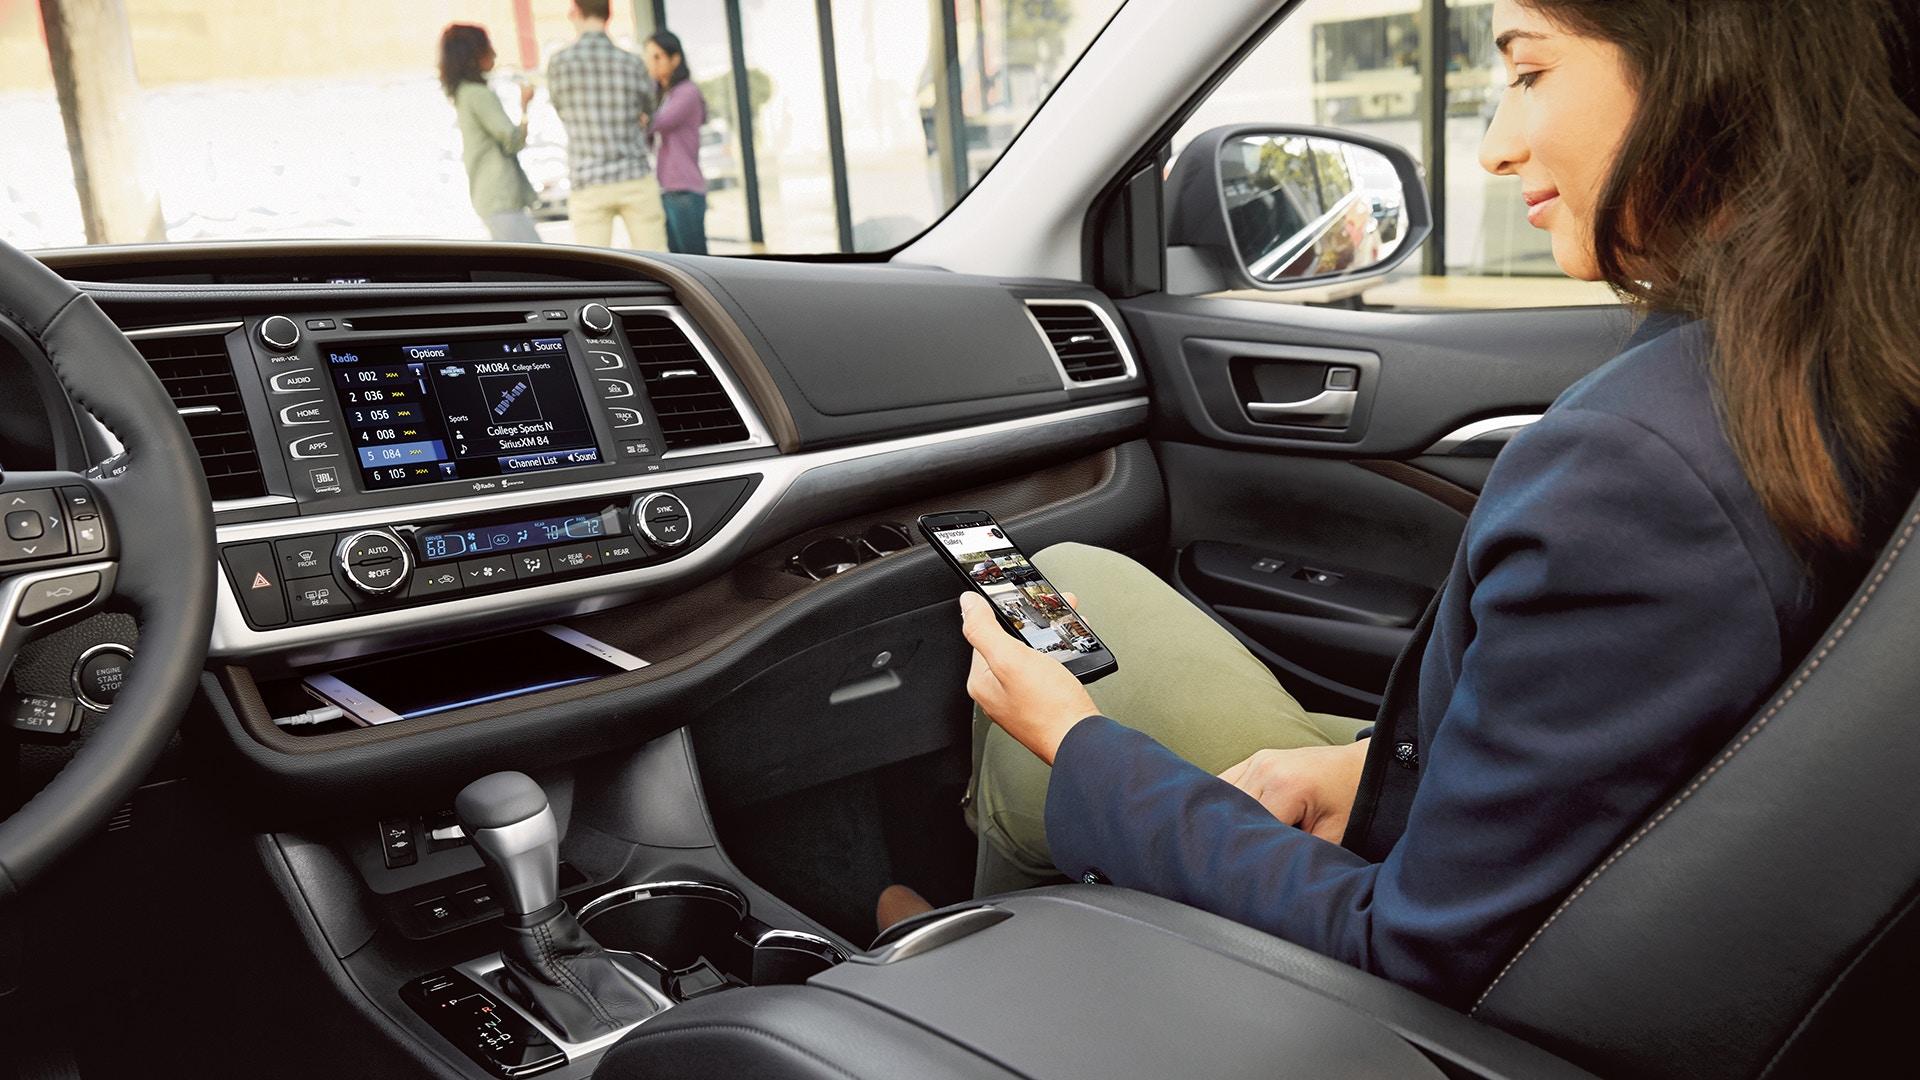 Interior of the 2019 Toyota Highlander